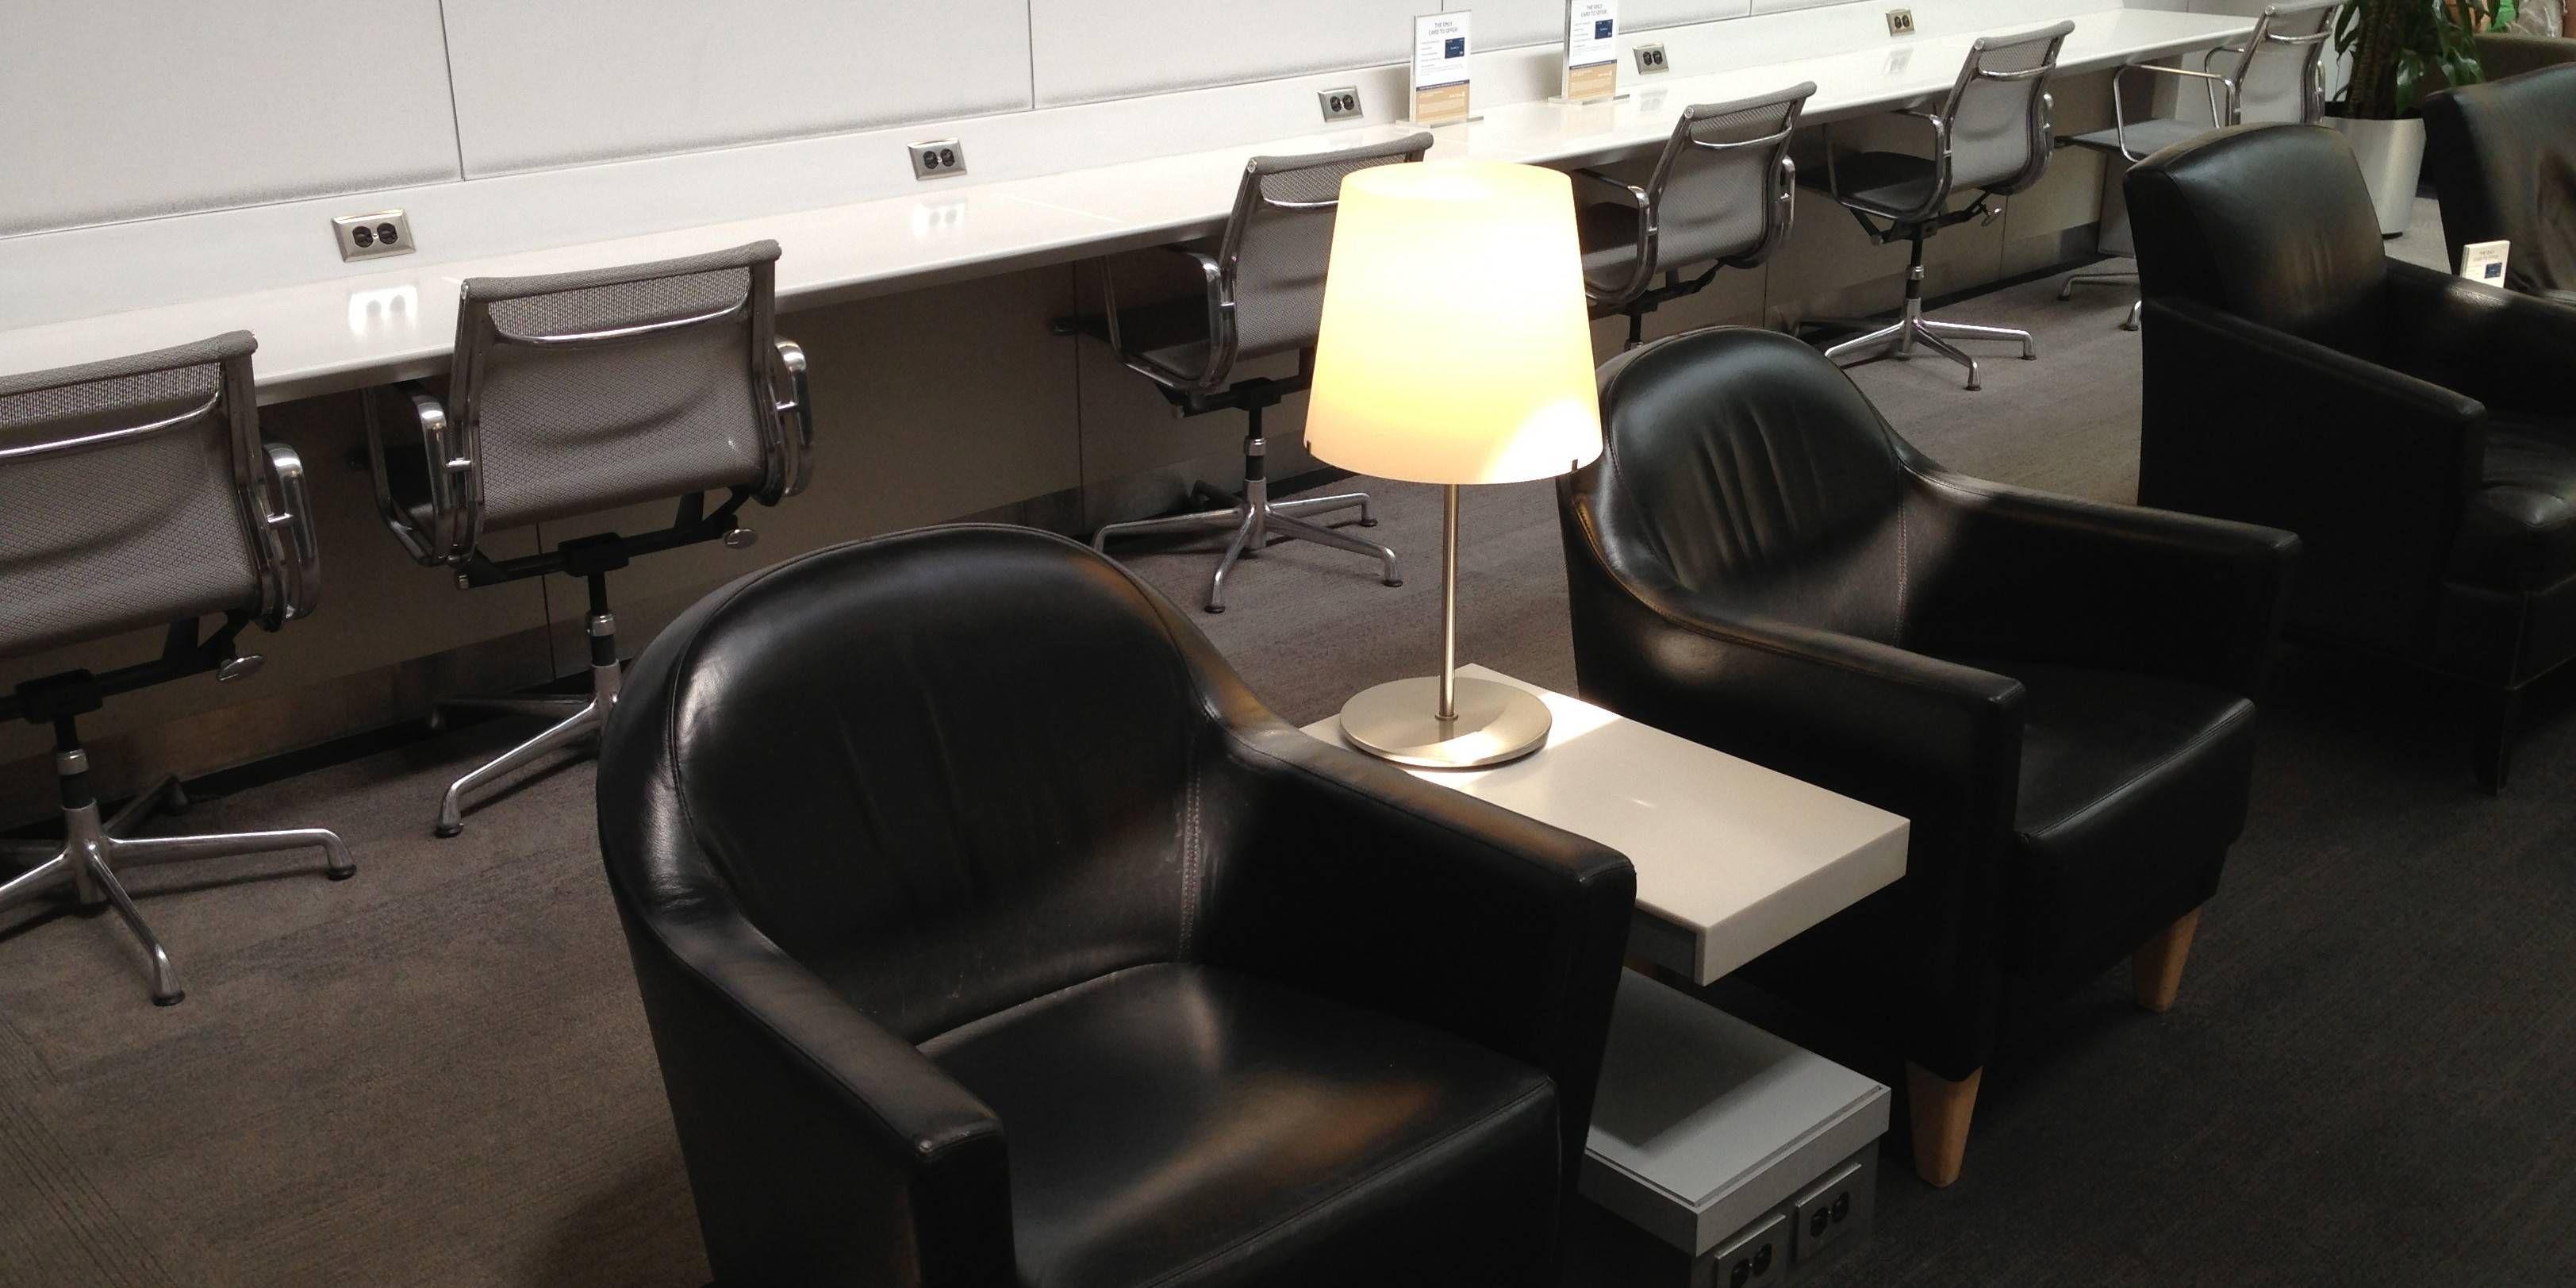 Sala VIP United Club no Aeroporto de Chicago – Terminal 2